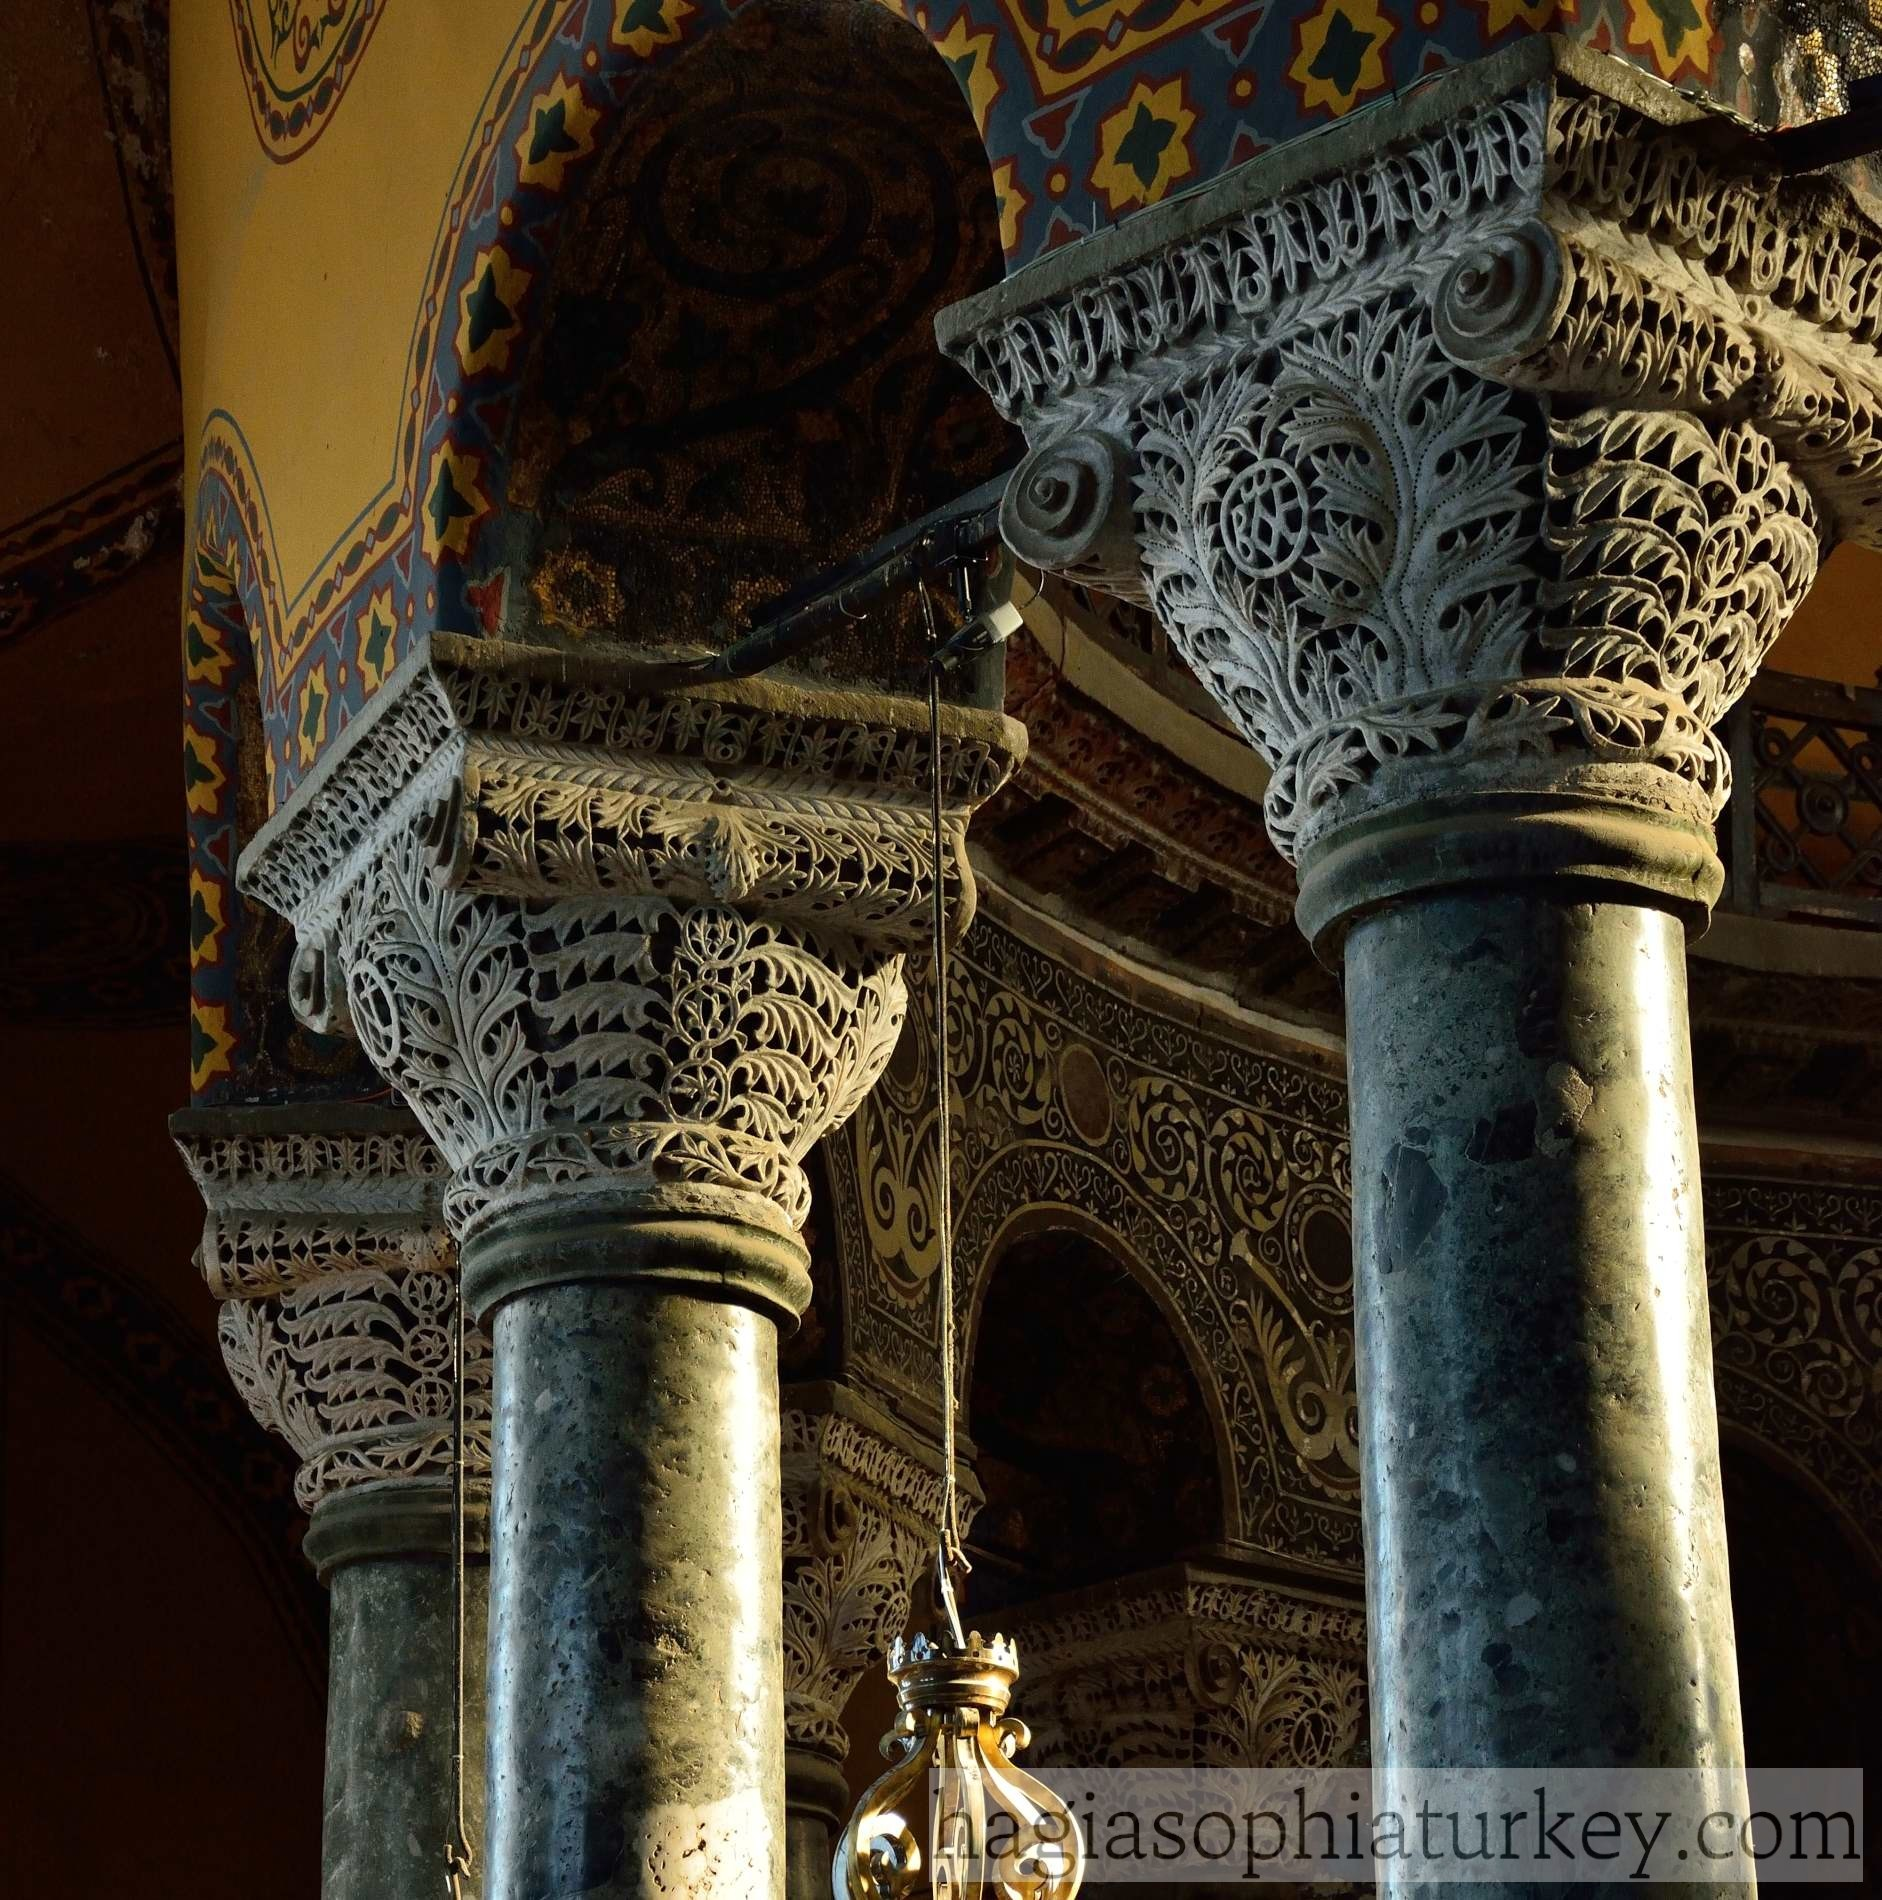 324 CE-726 Early Byzantine Art   Ancient to Medieval Art   Hagia Sophia Interior Columns